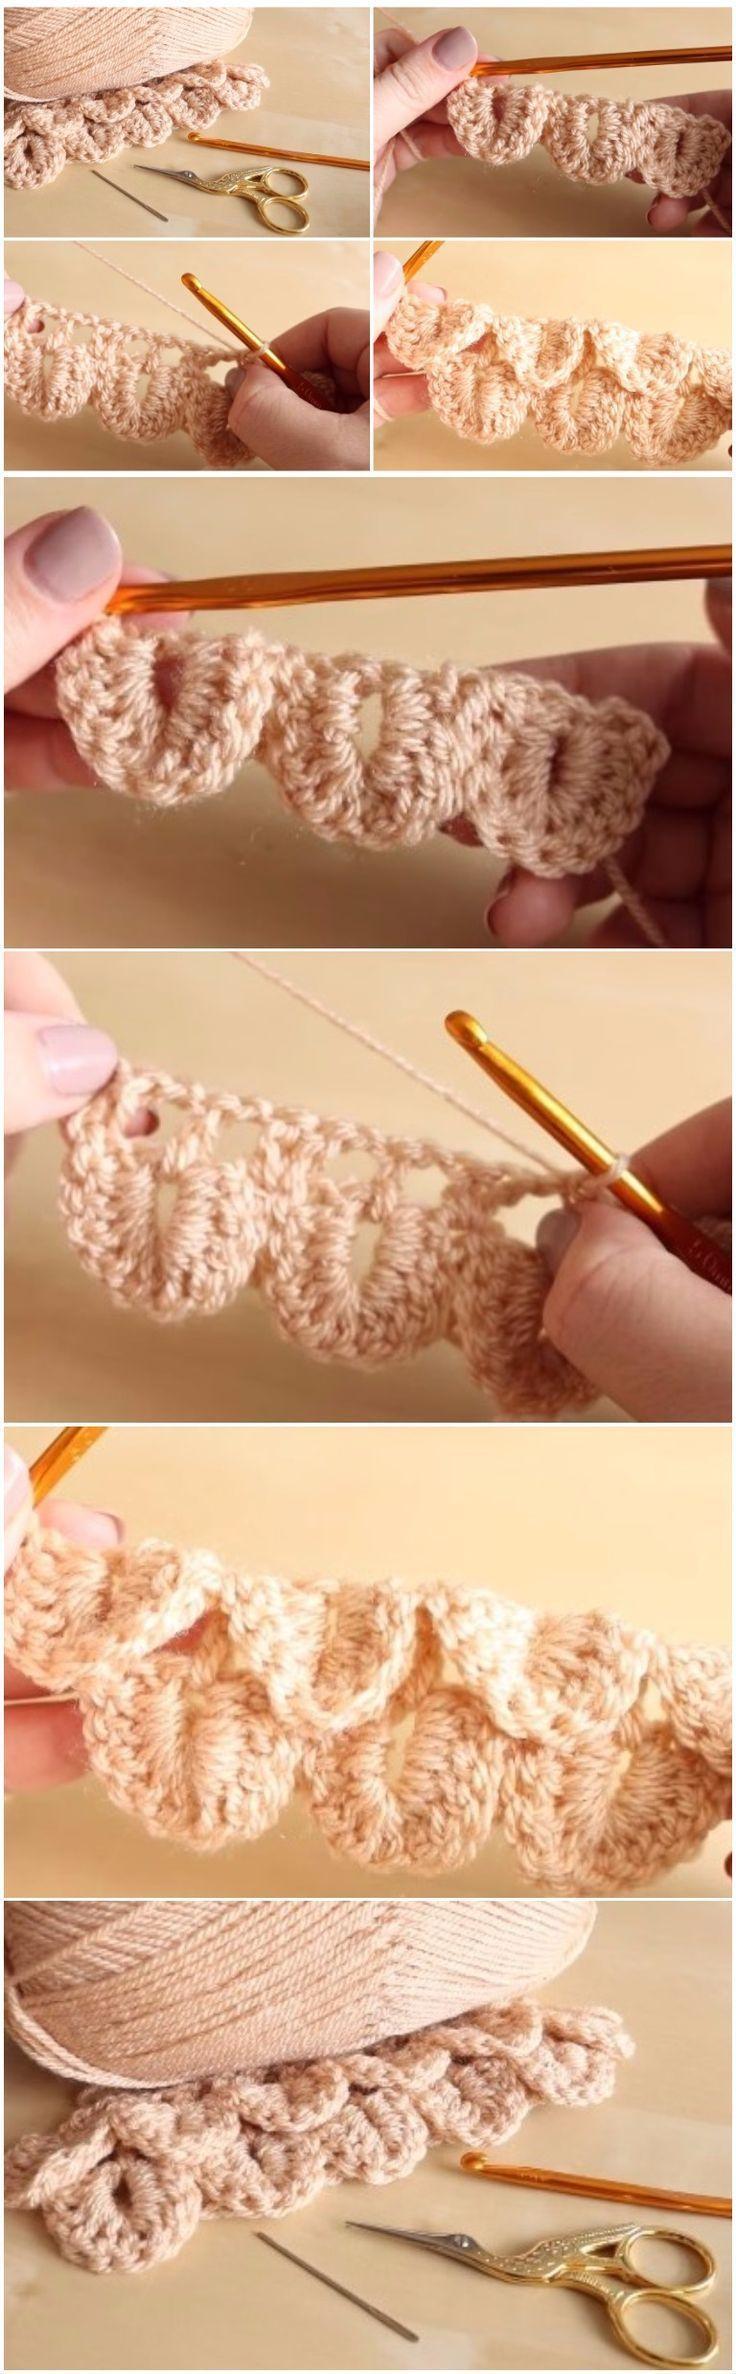 Crochet Crocodile Stitch Step By Step - #Crochet #Crocodile #step #Stitch #stitching